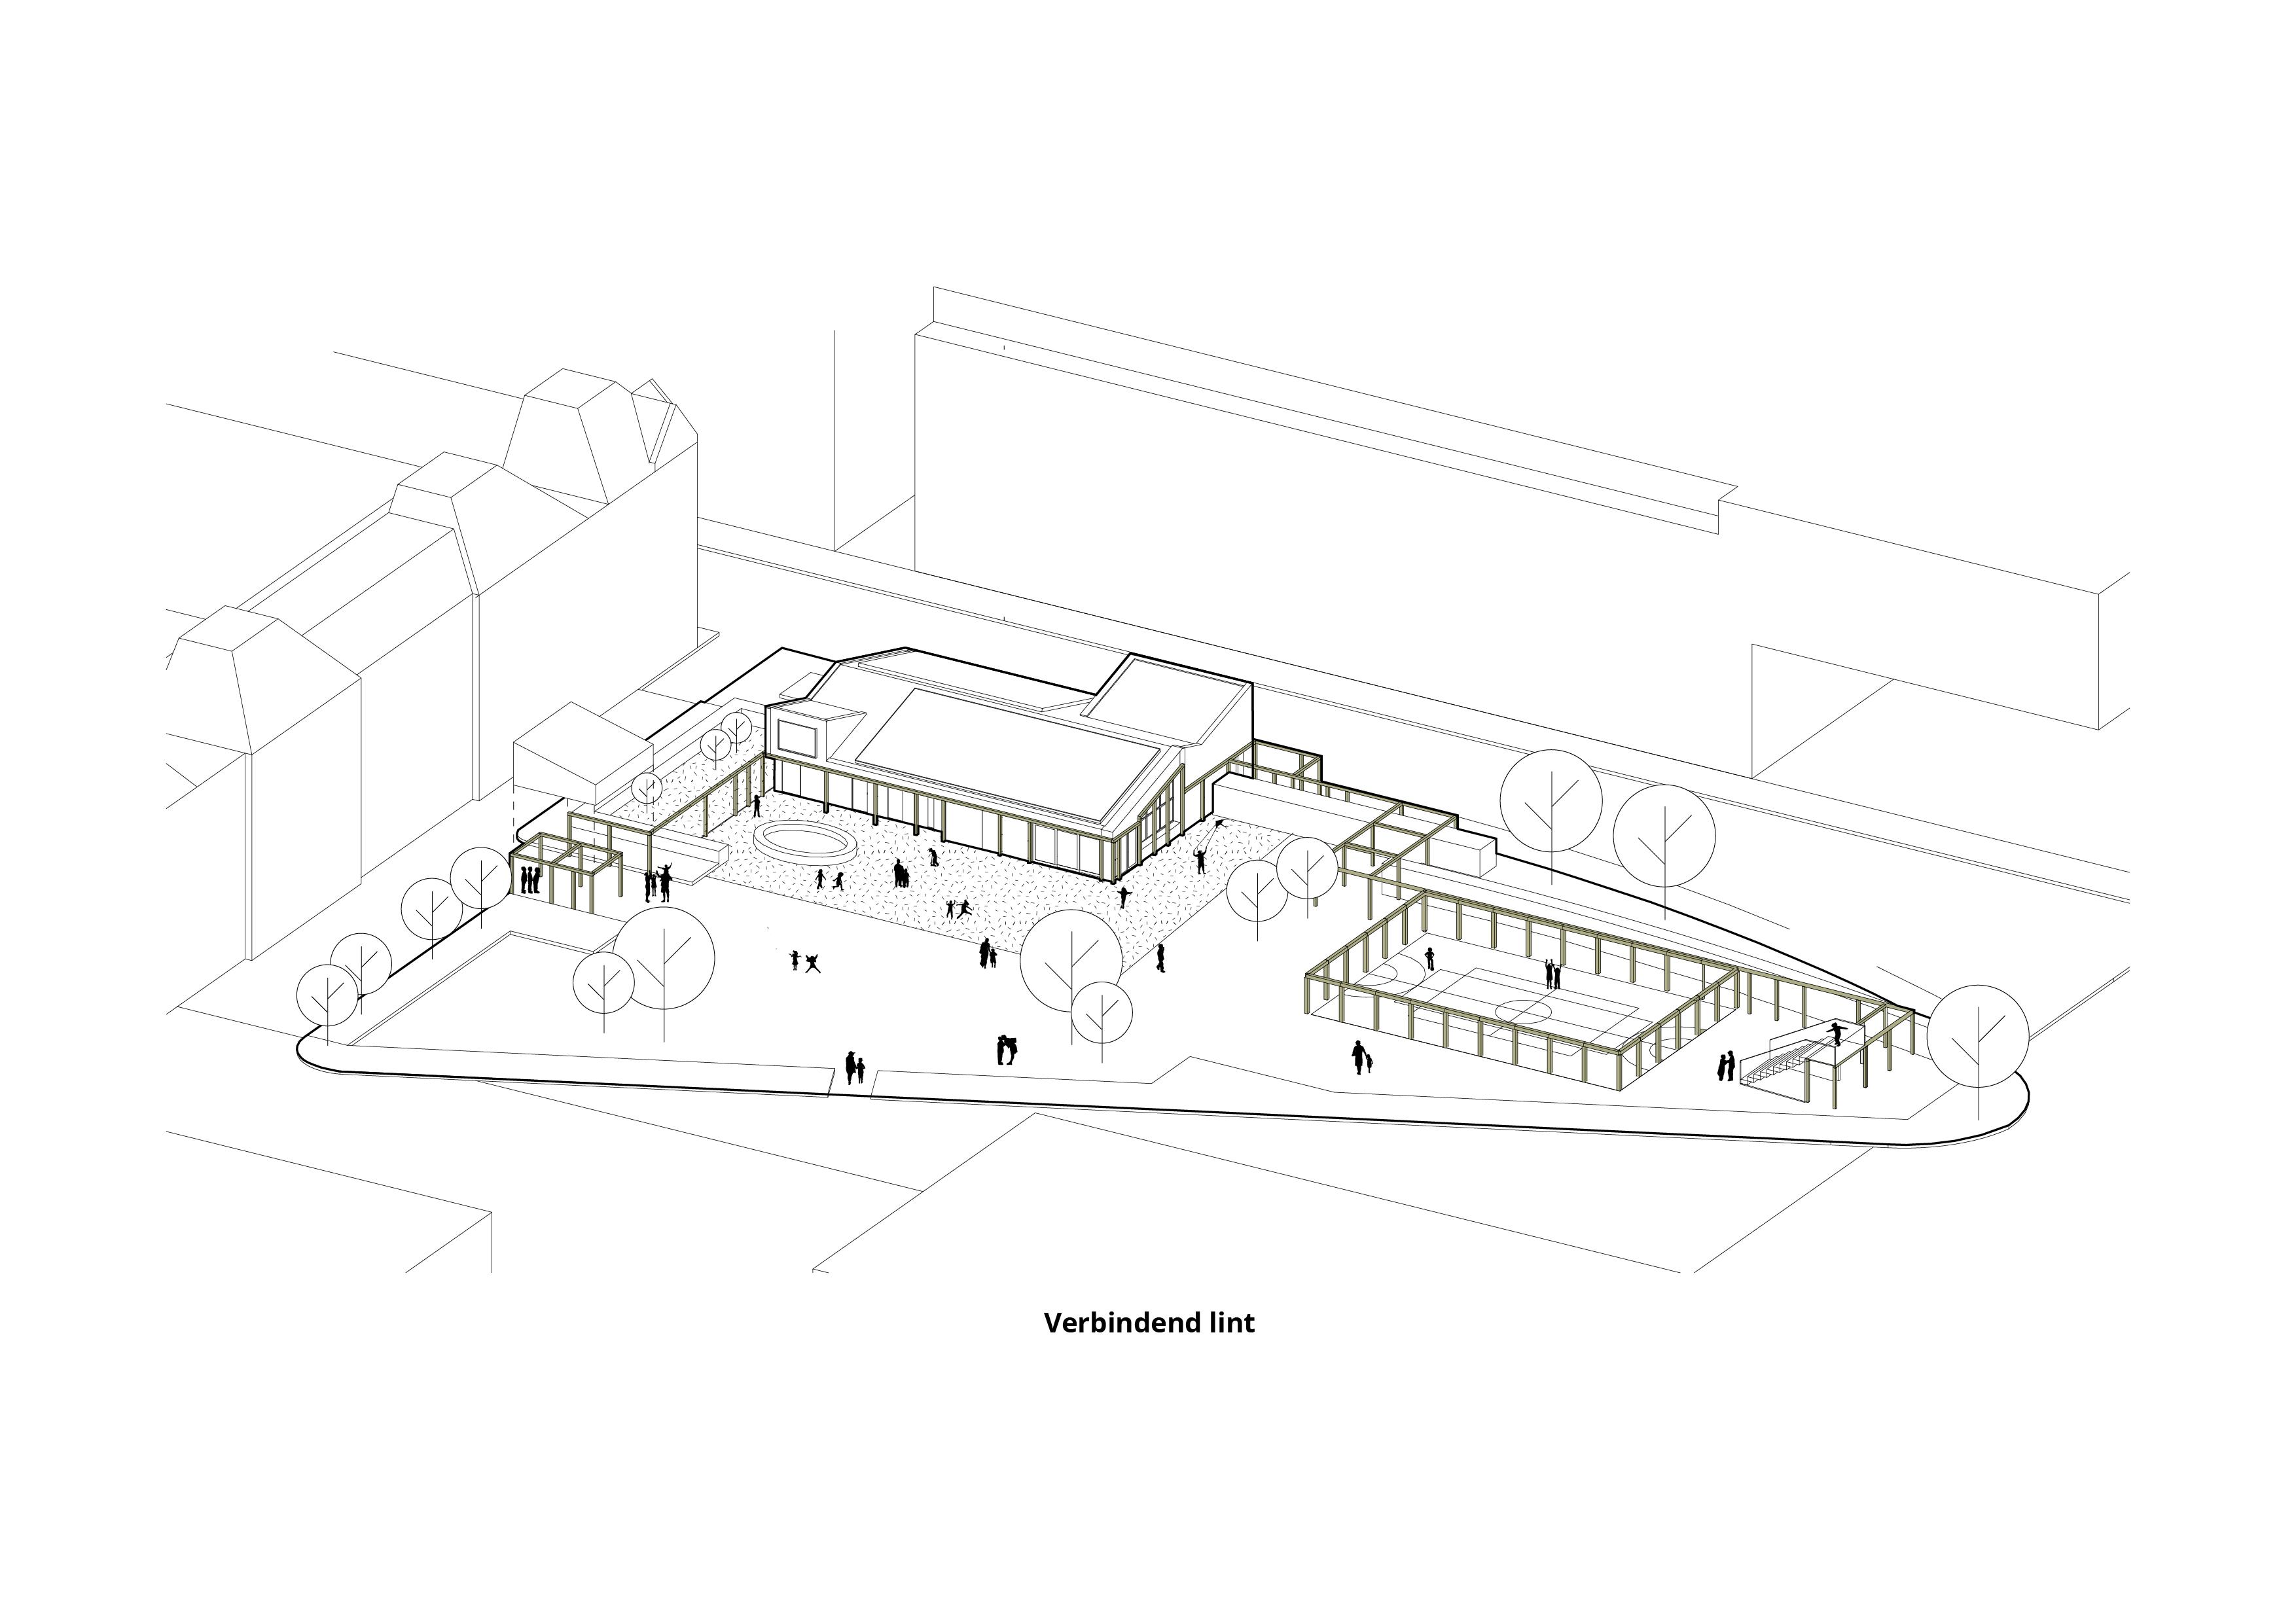 Speeltuingebouw Barentzplein – Verbindend lint